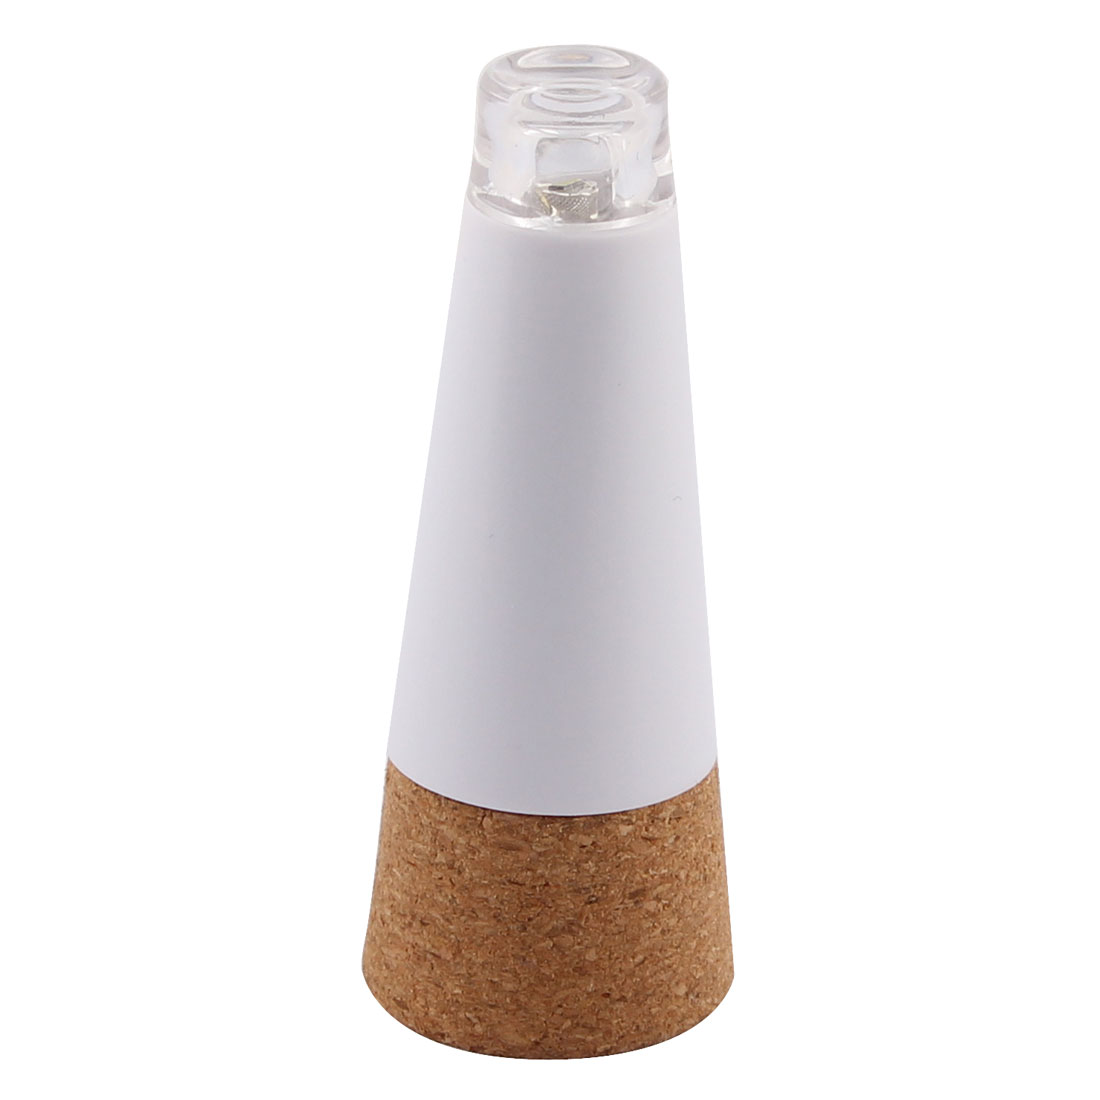 Cork Shaped USB Rechargeable LED Lamp Stopper Decor Empty Wine Bottle Light